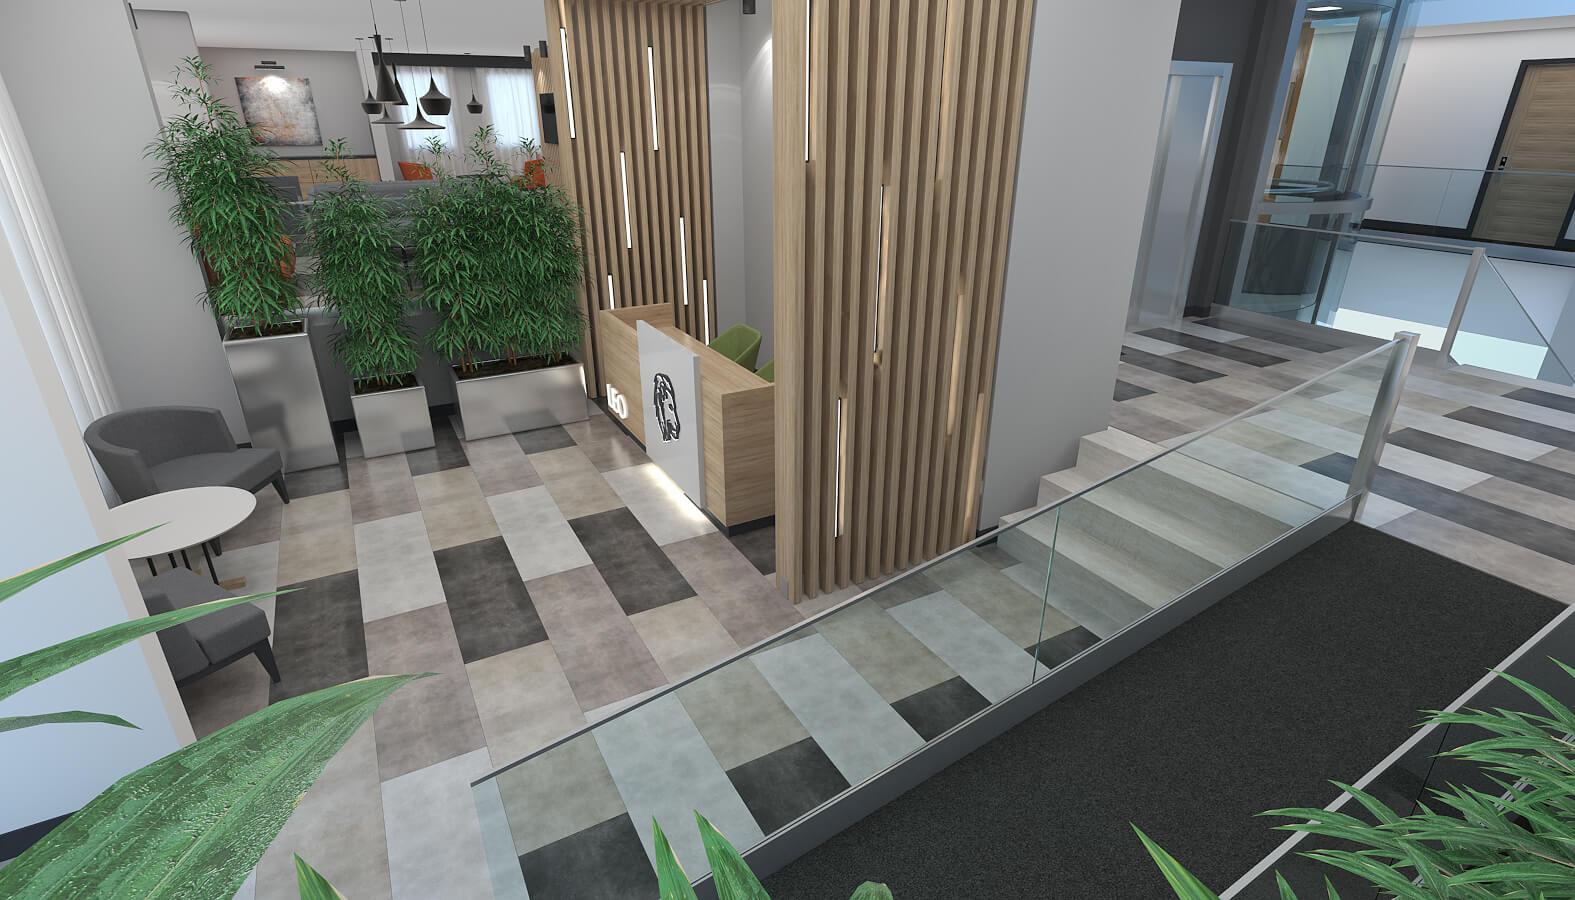 Hotel Architecture and Interior Design Leo